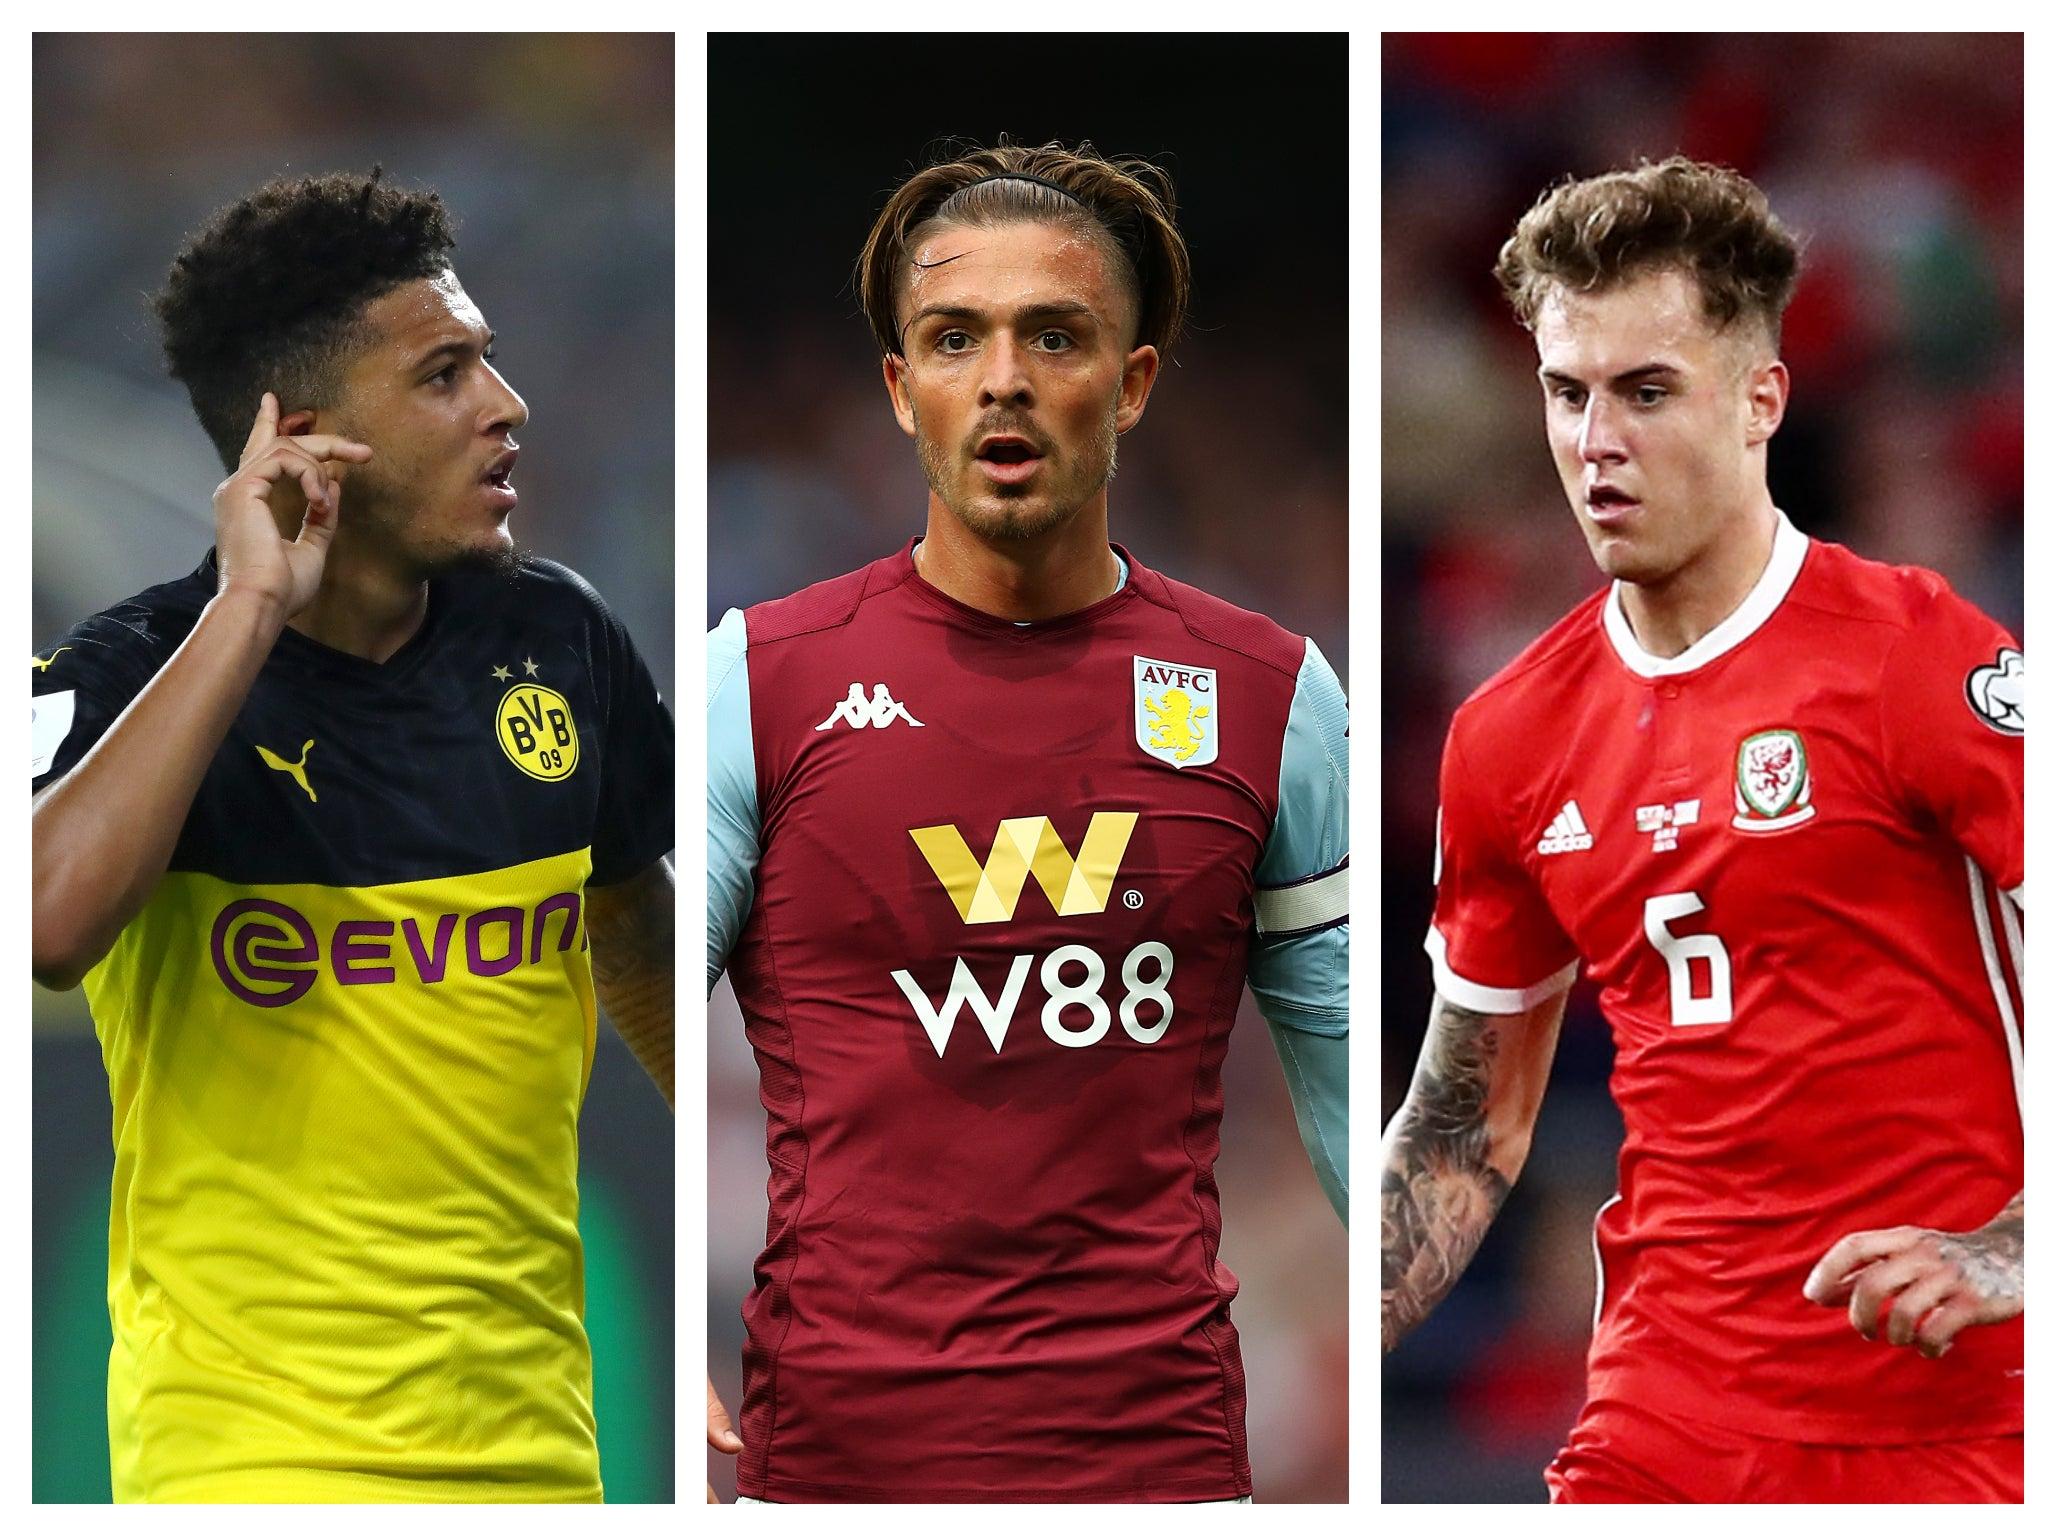 Revealed: Manchester United's summer transfer priority list including Jadon Sancho, Jack Grealish and Joe Rodon